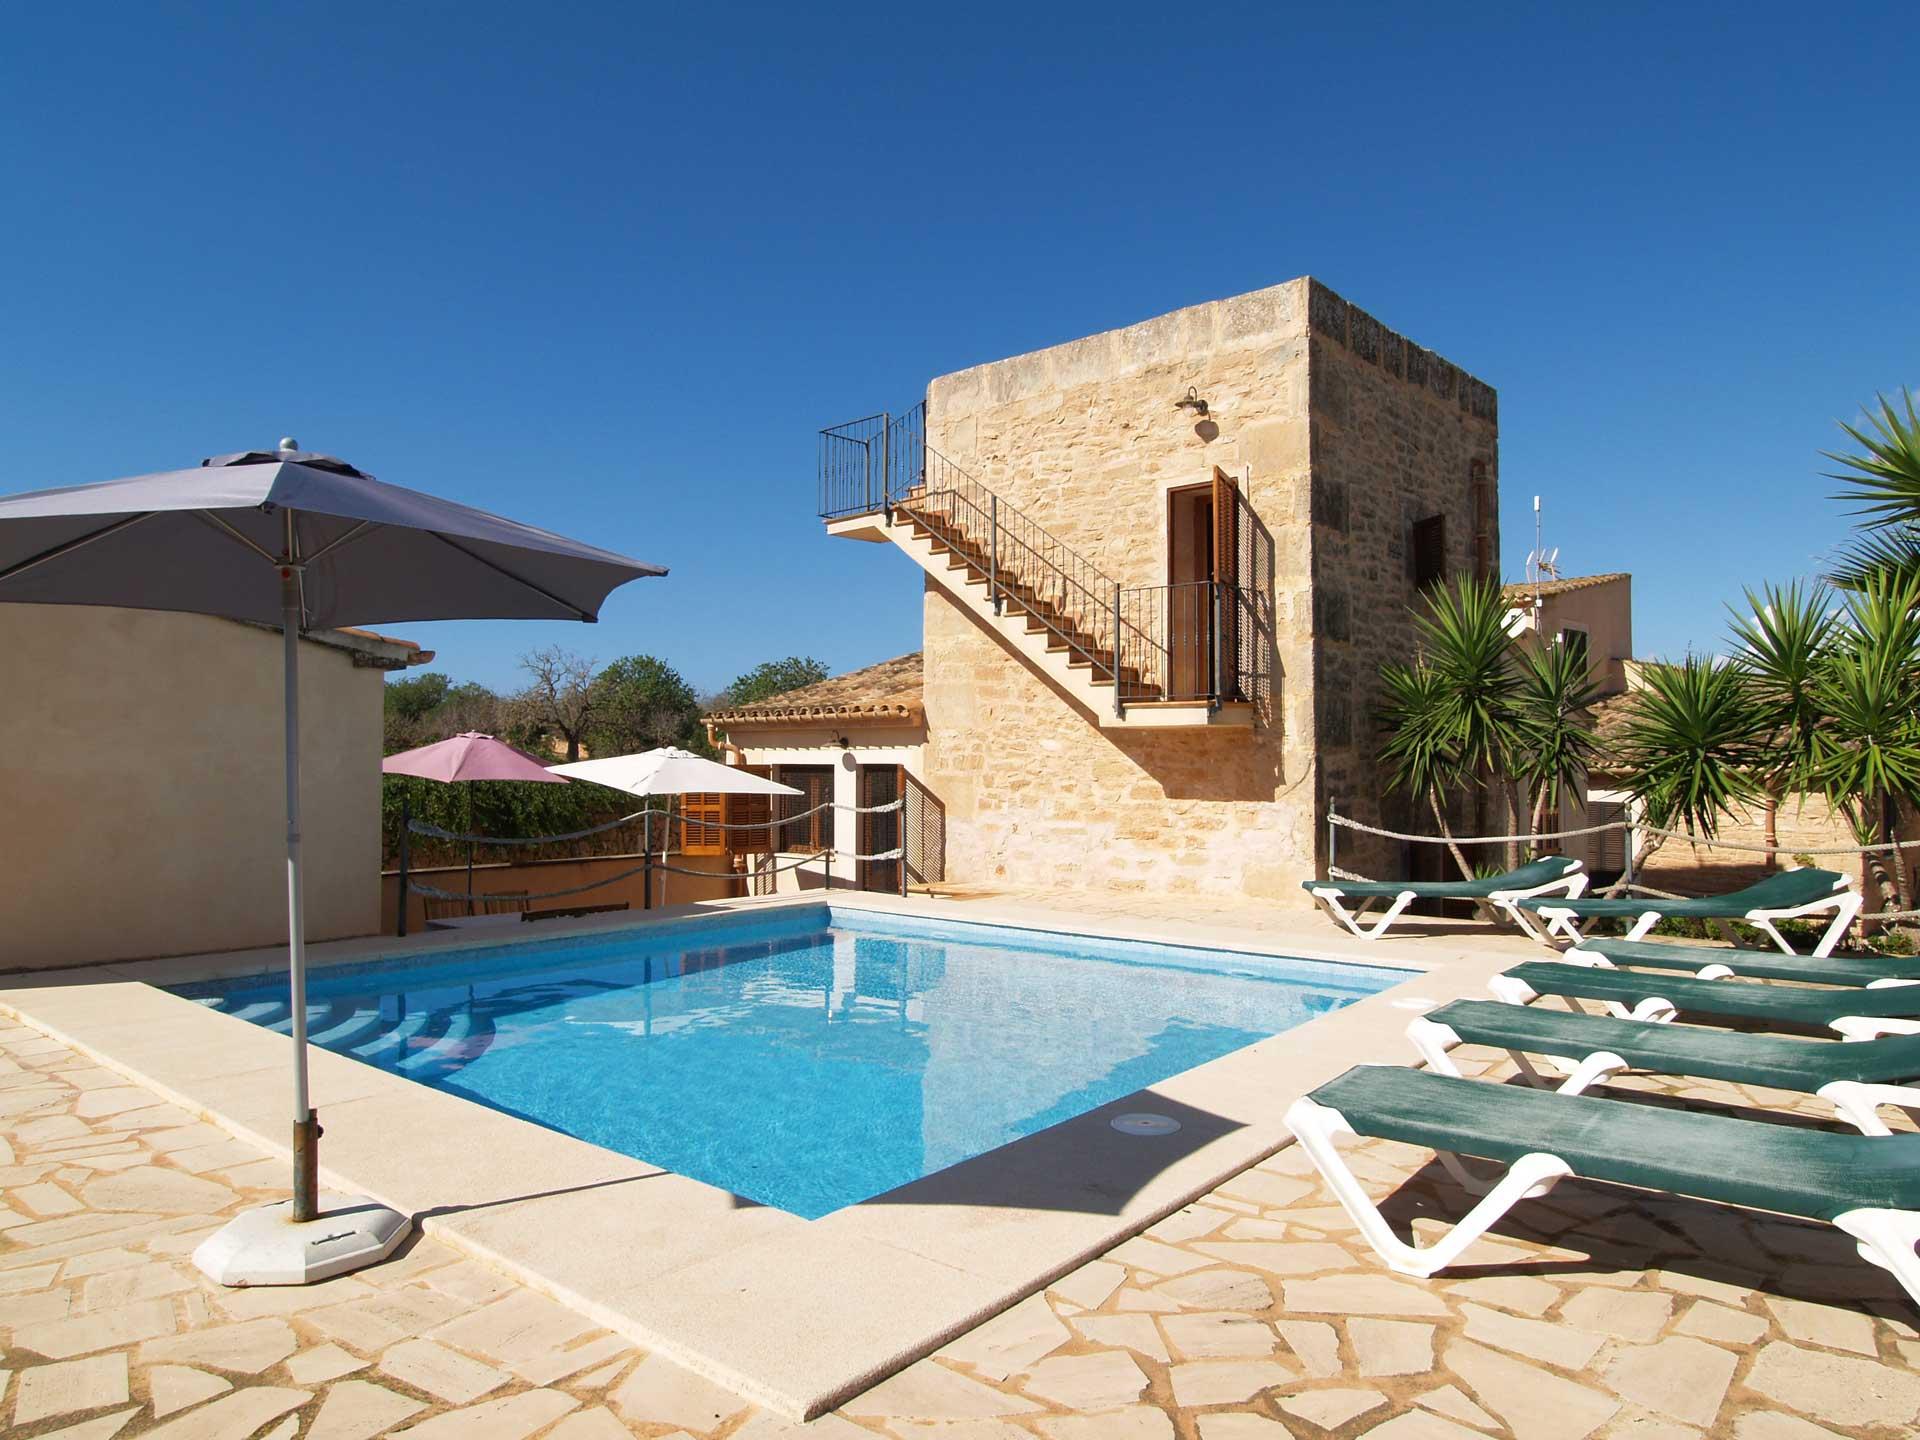 Urlaub ferienhaus mallorca mieten ferienhaus auf for Alquiler maquinaria mallorca